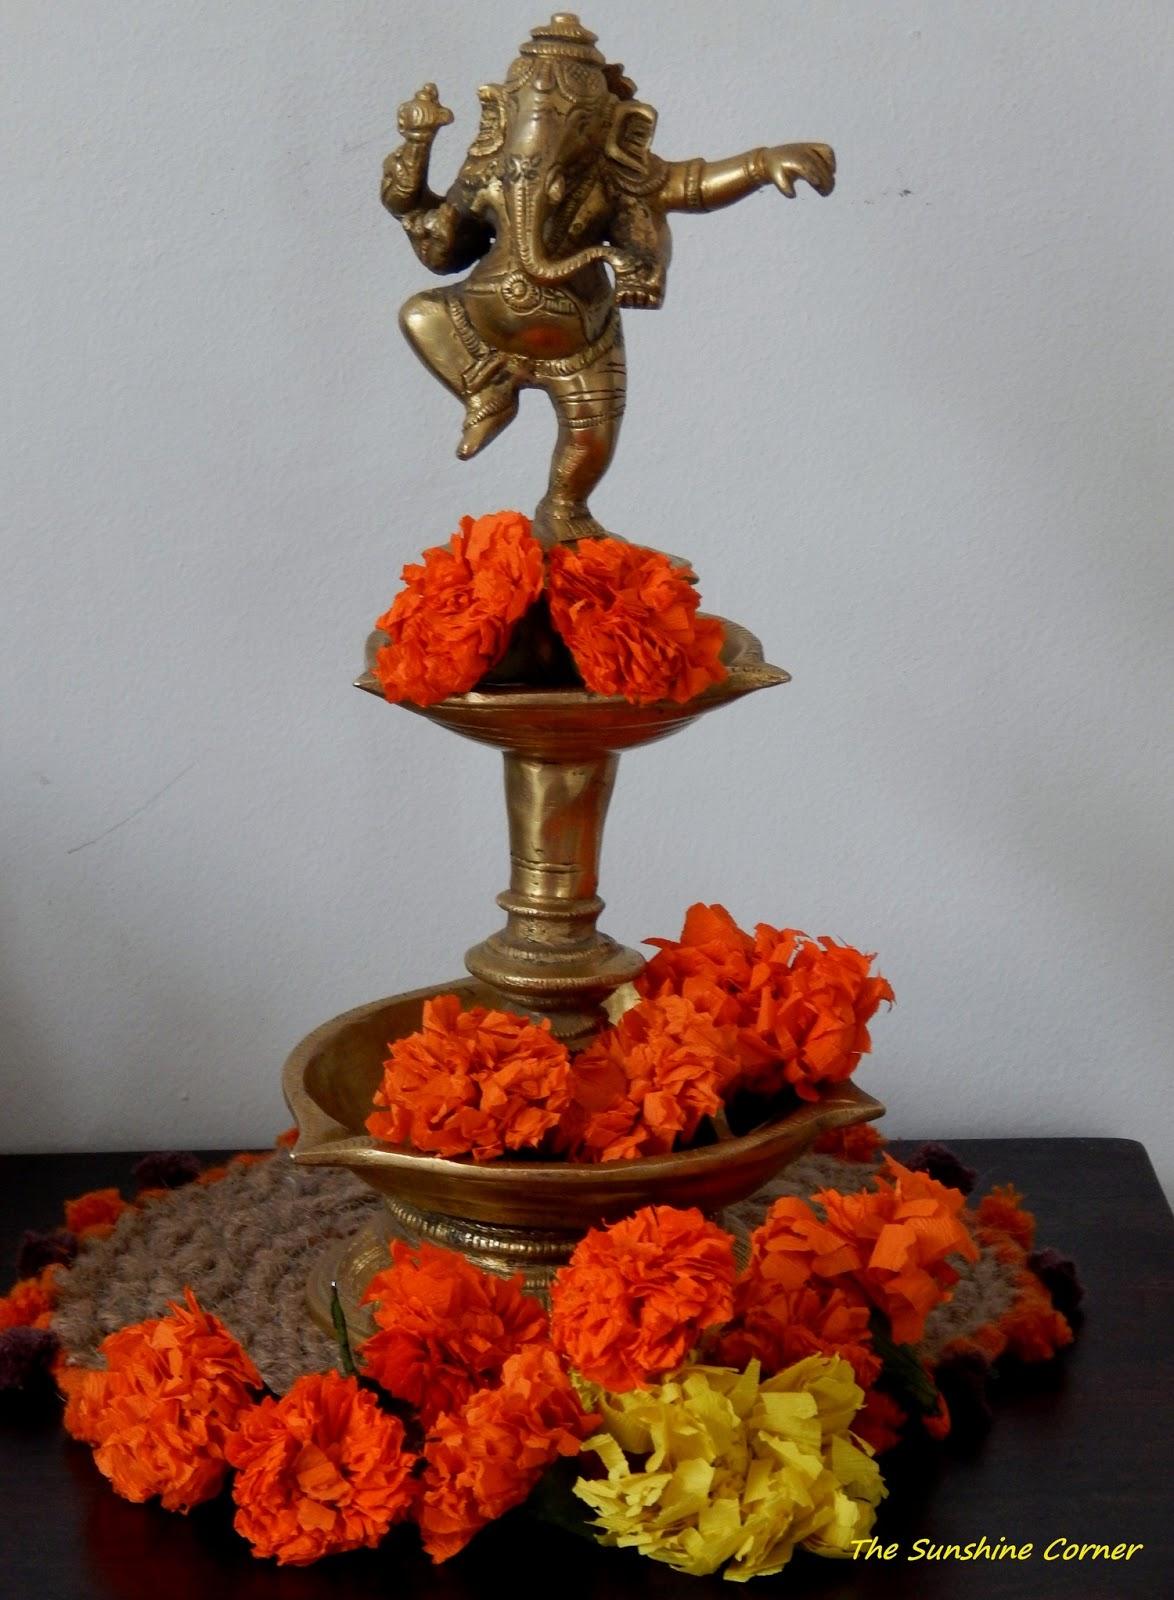 The Sunshine Corner Diwali Decor Crepe Paper Marigolds